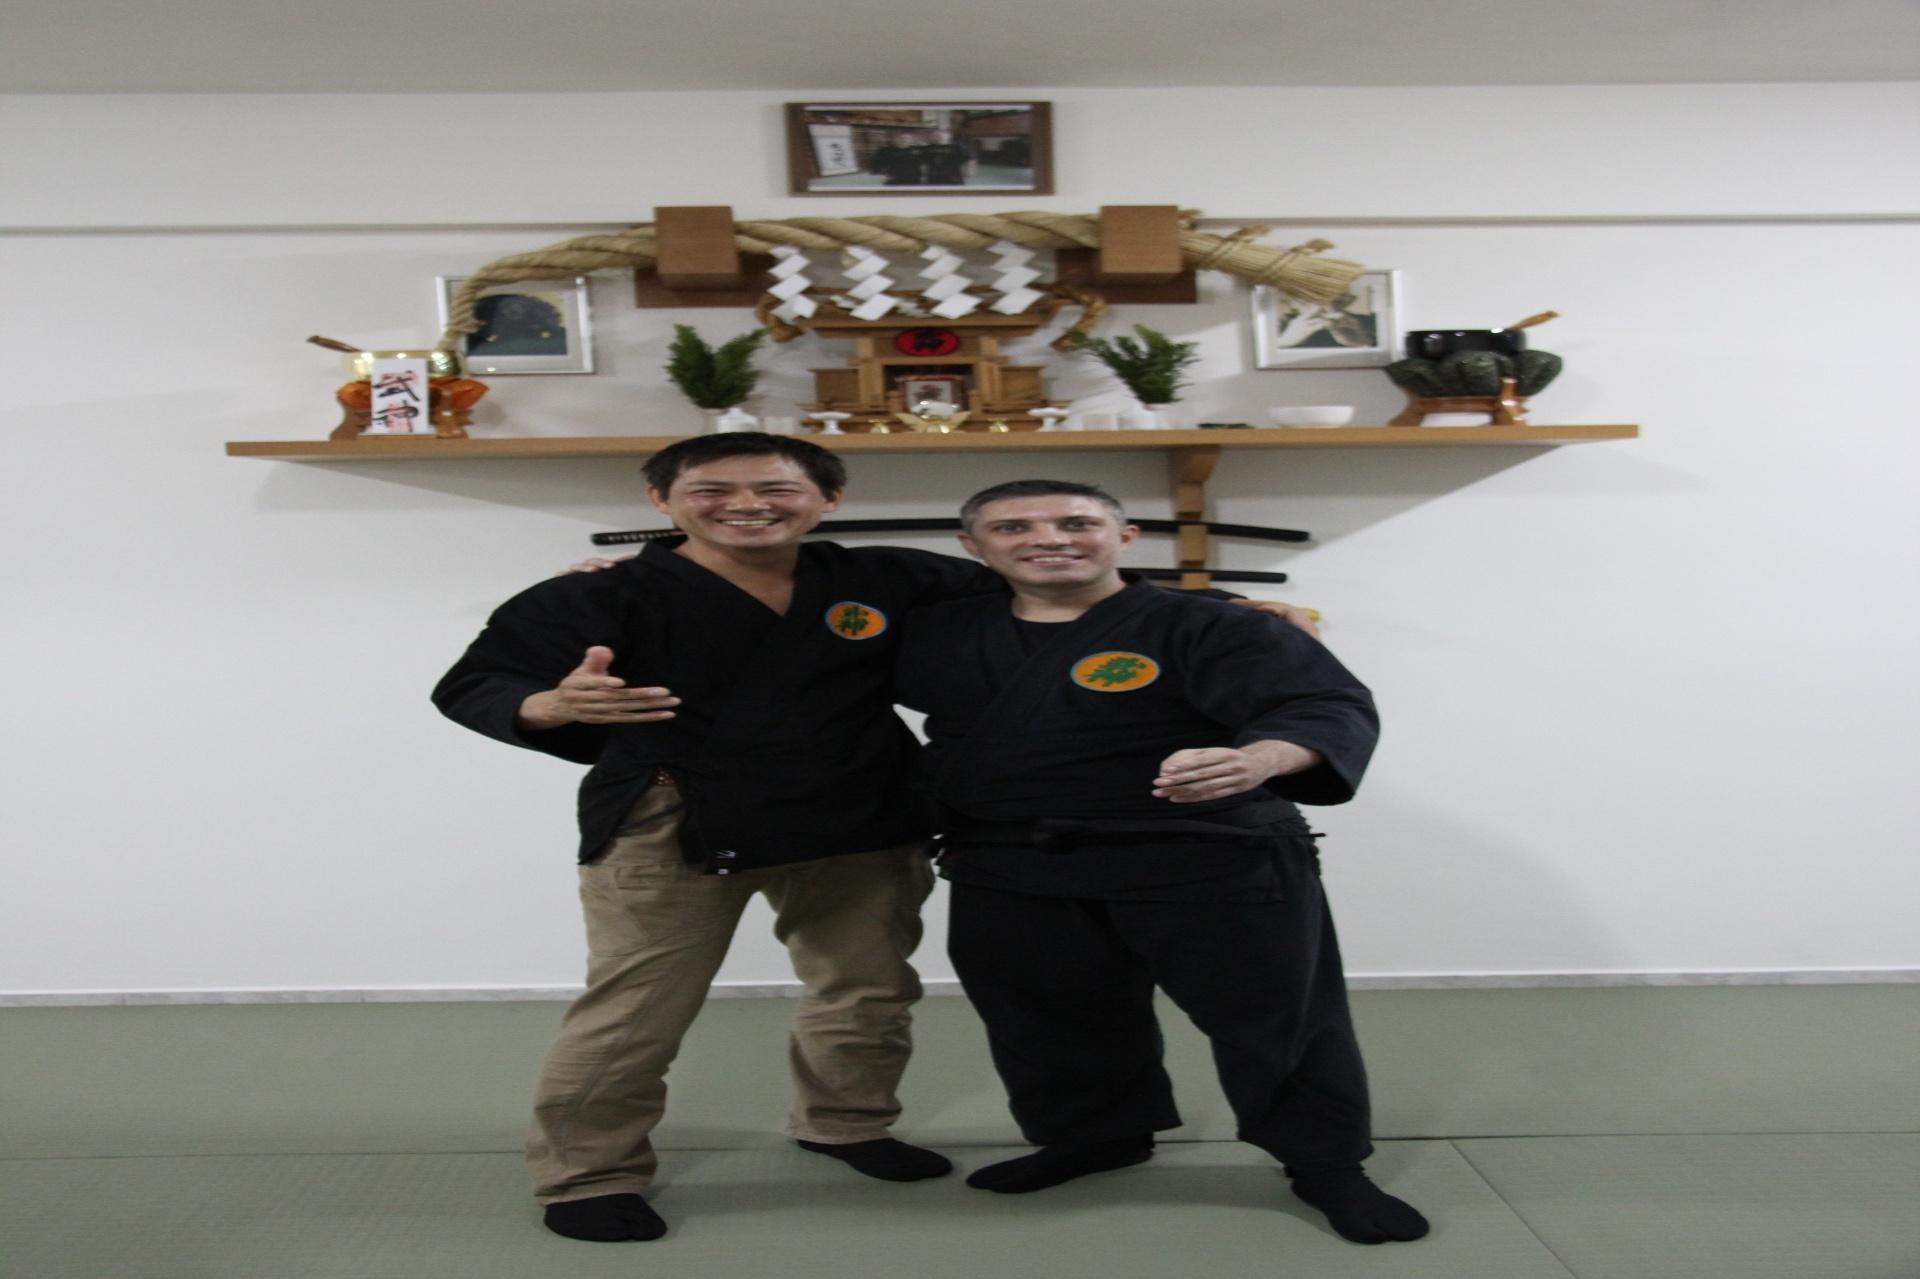 Fernando Cardoso e o ator Takumi Tsutsui, protagonista da série Jiraya, o Incrível Ninja